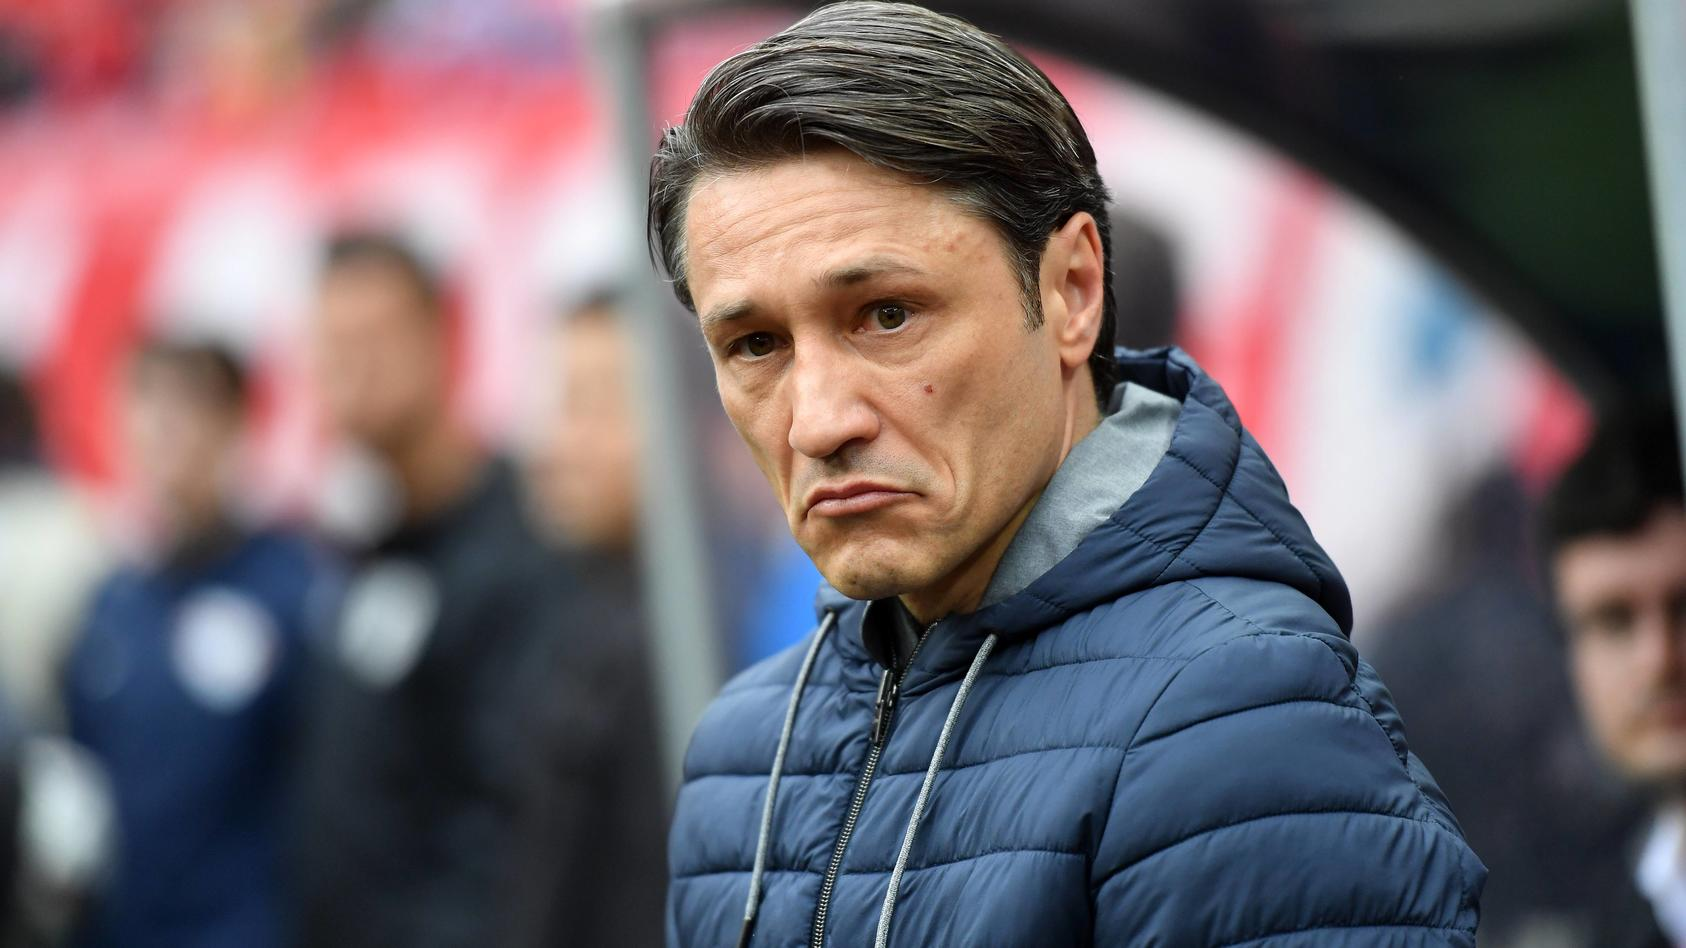 Niko Kovac Trainer FC Bayern kurz vor Spielbeginn RB Leipzig FC Bayern München 1 Bundesliga 201